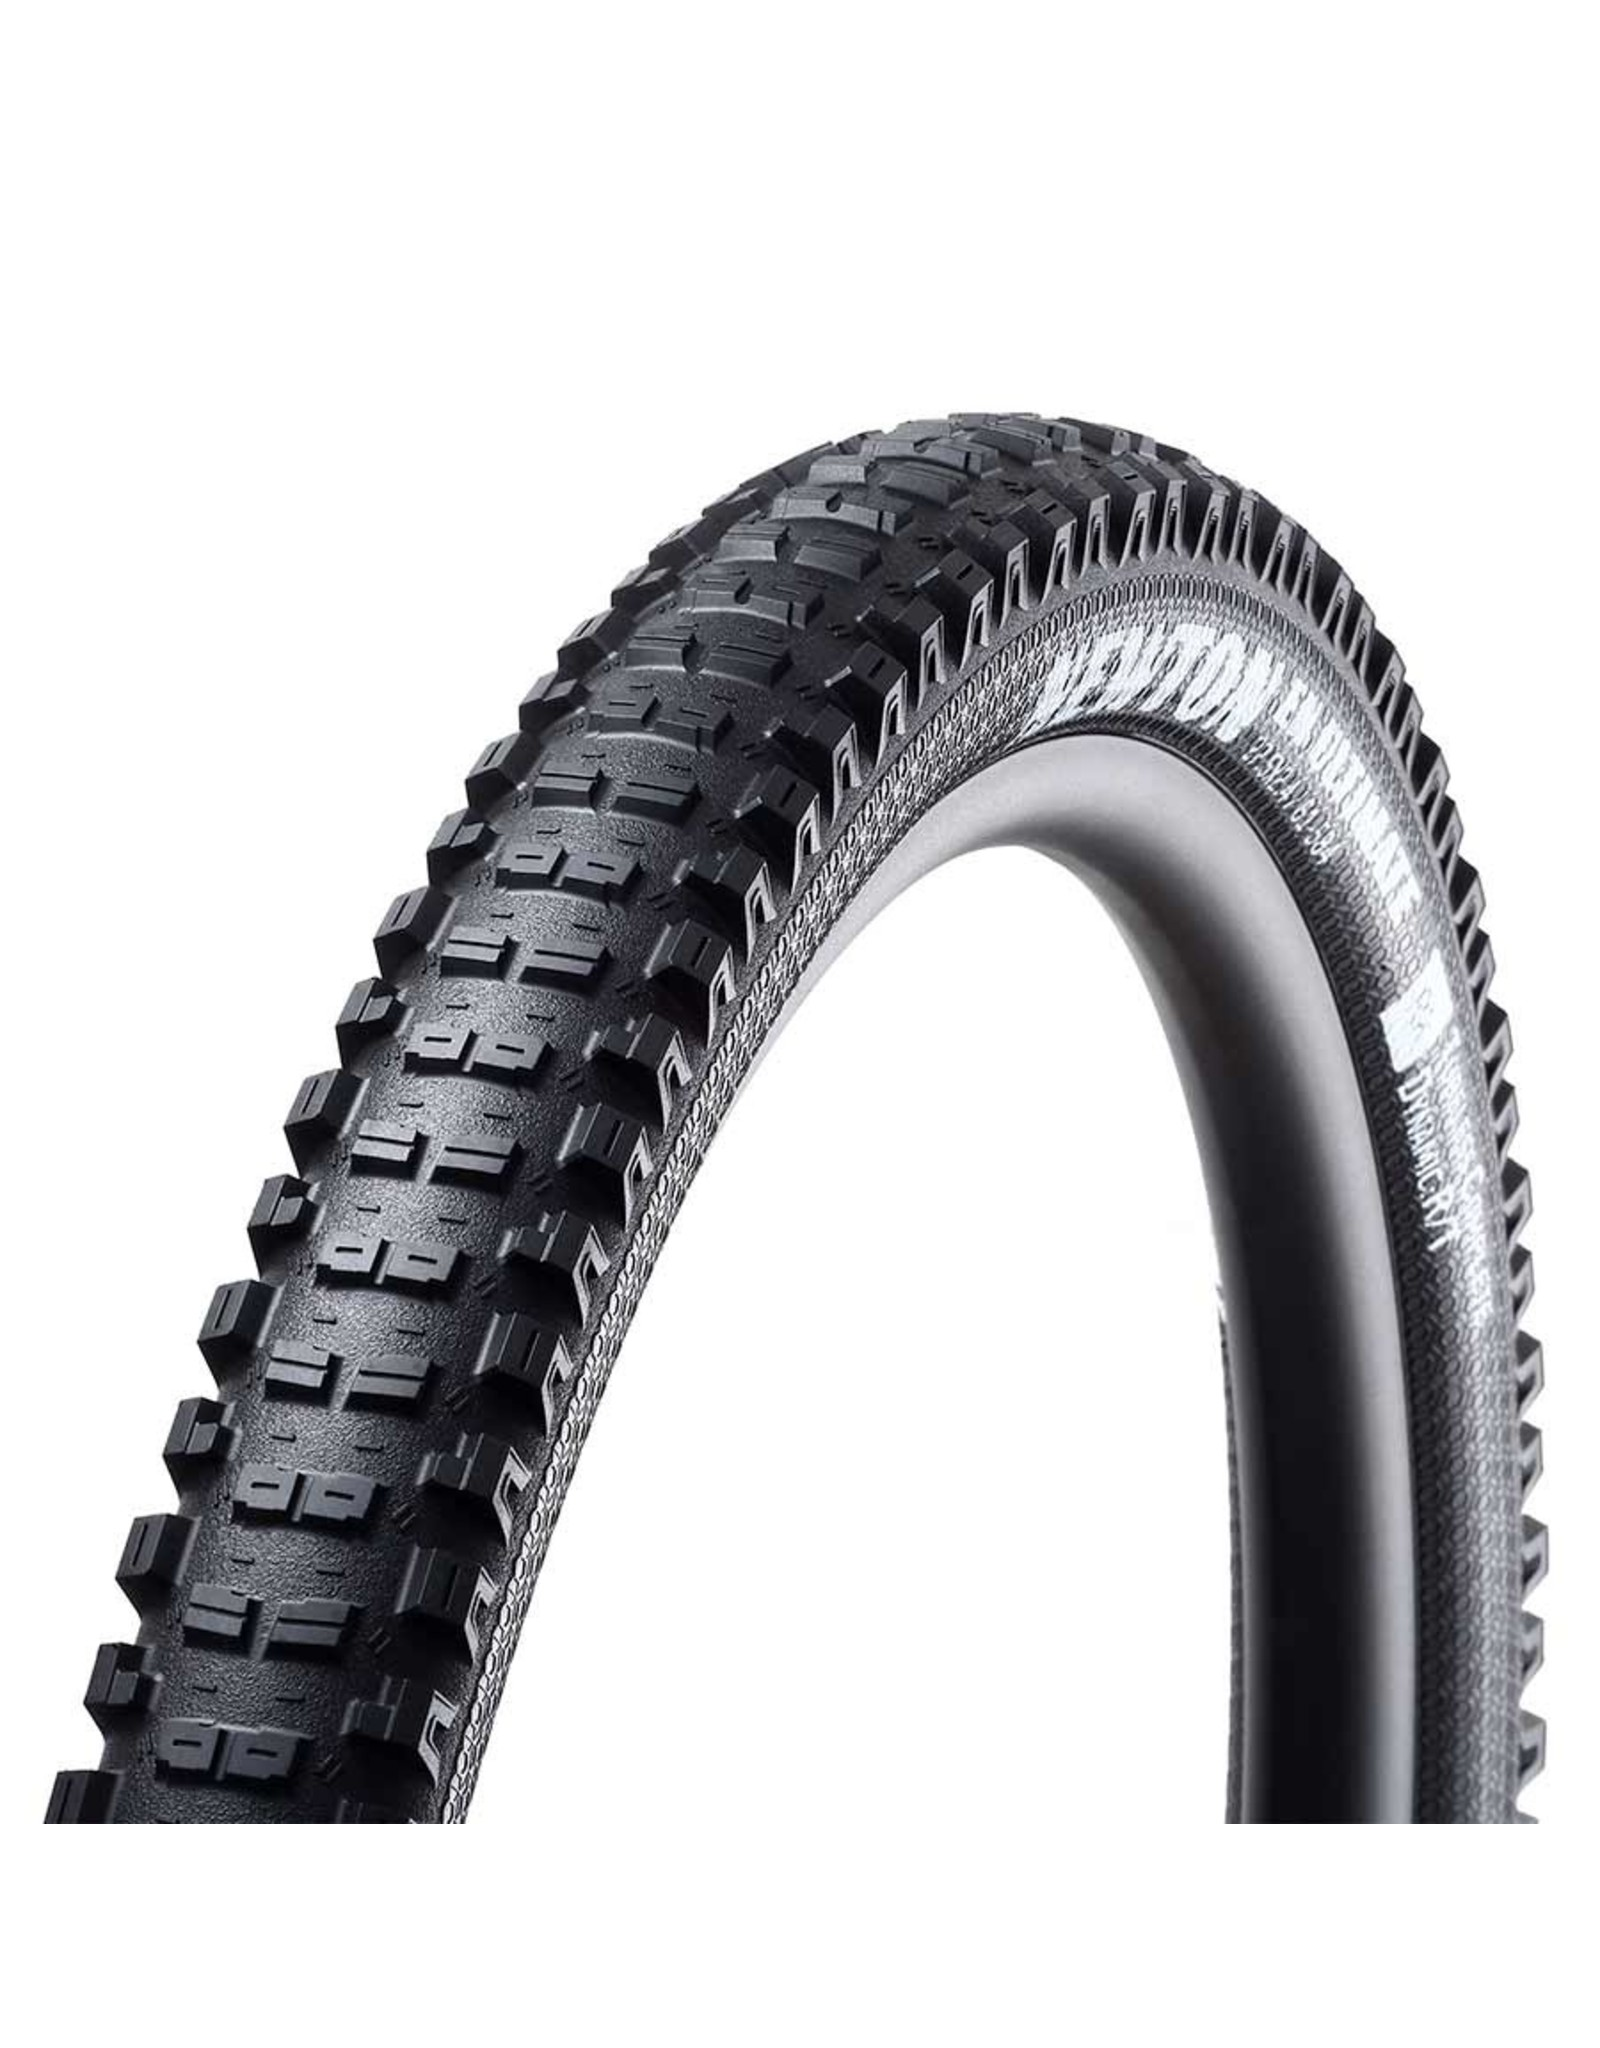 Goodyear Goodyear, Newton, Tire, 27.5''x2.60, Folding, Tubeless Ready, Dynamic:R/T, EN Ultimate, 240TPI, Black